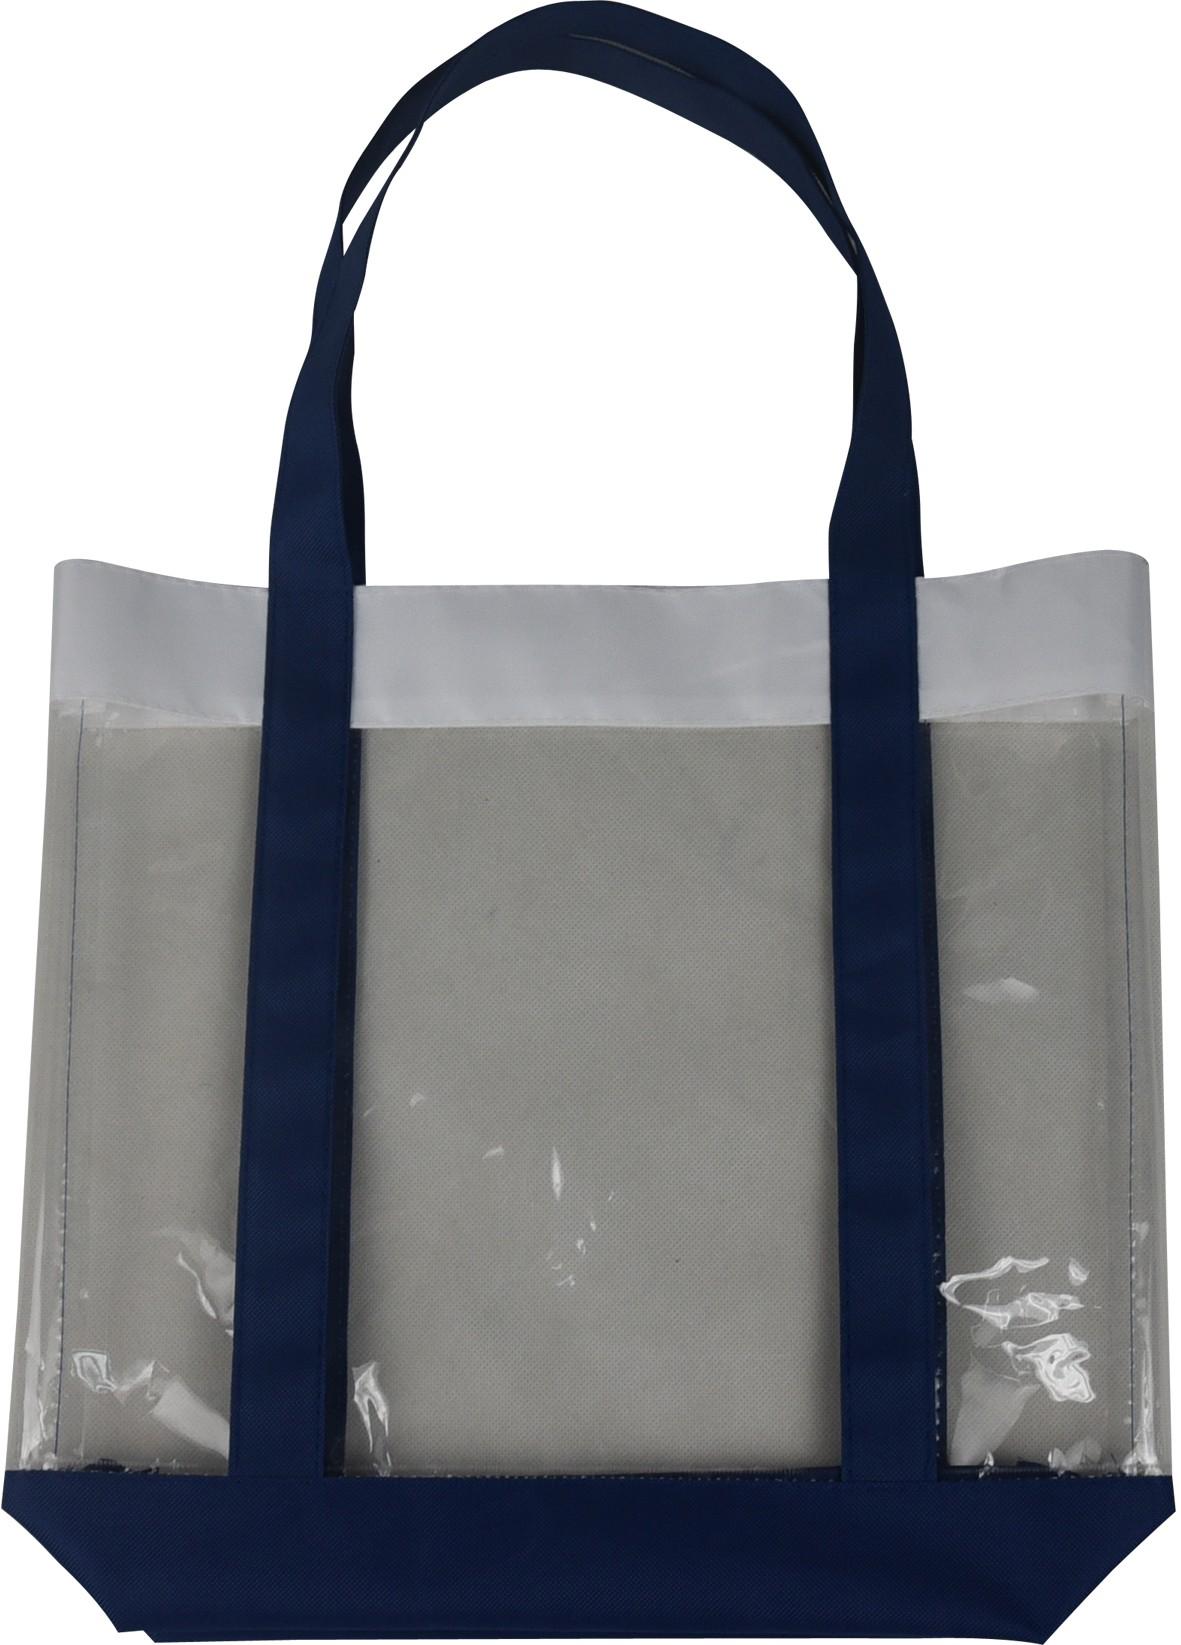 Buy PVC Beach Bag, Non Woven Handle Bag Suppliers, Non Woven Packaging Quotes